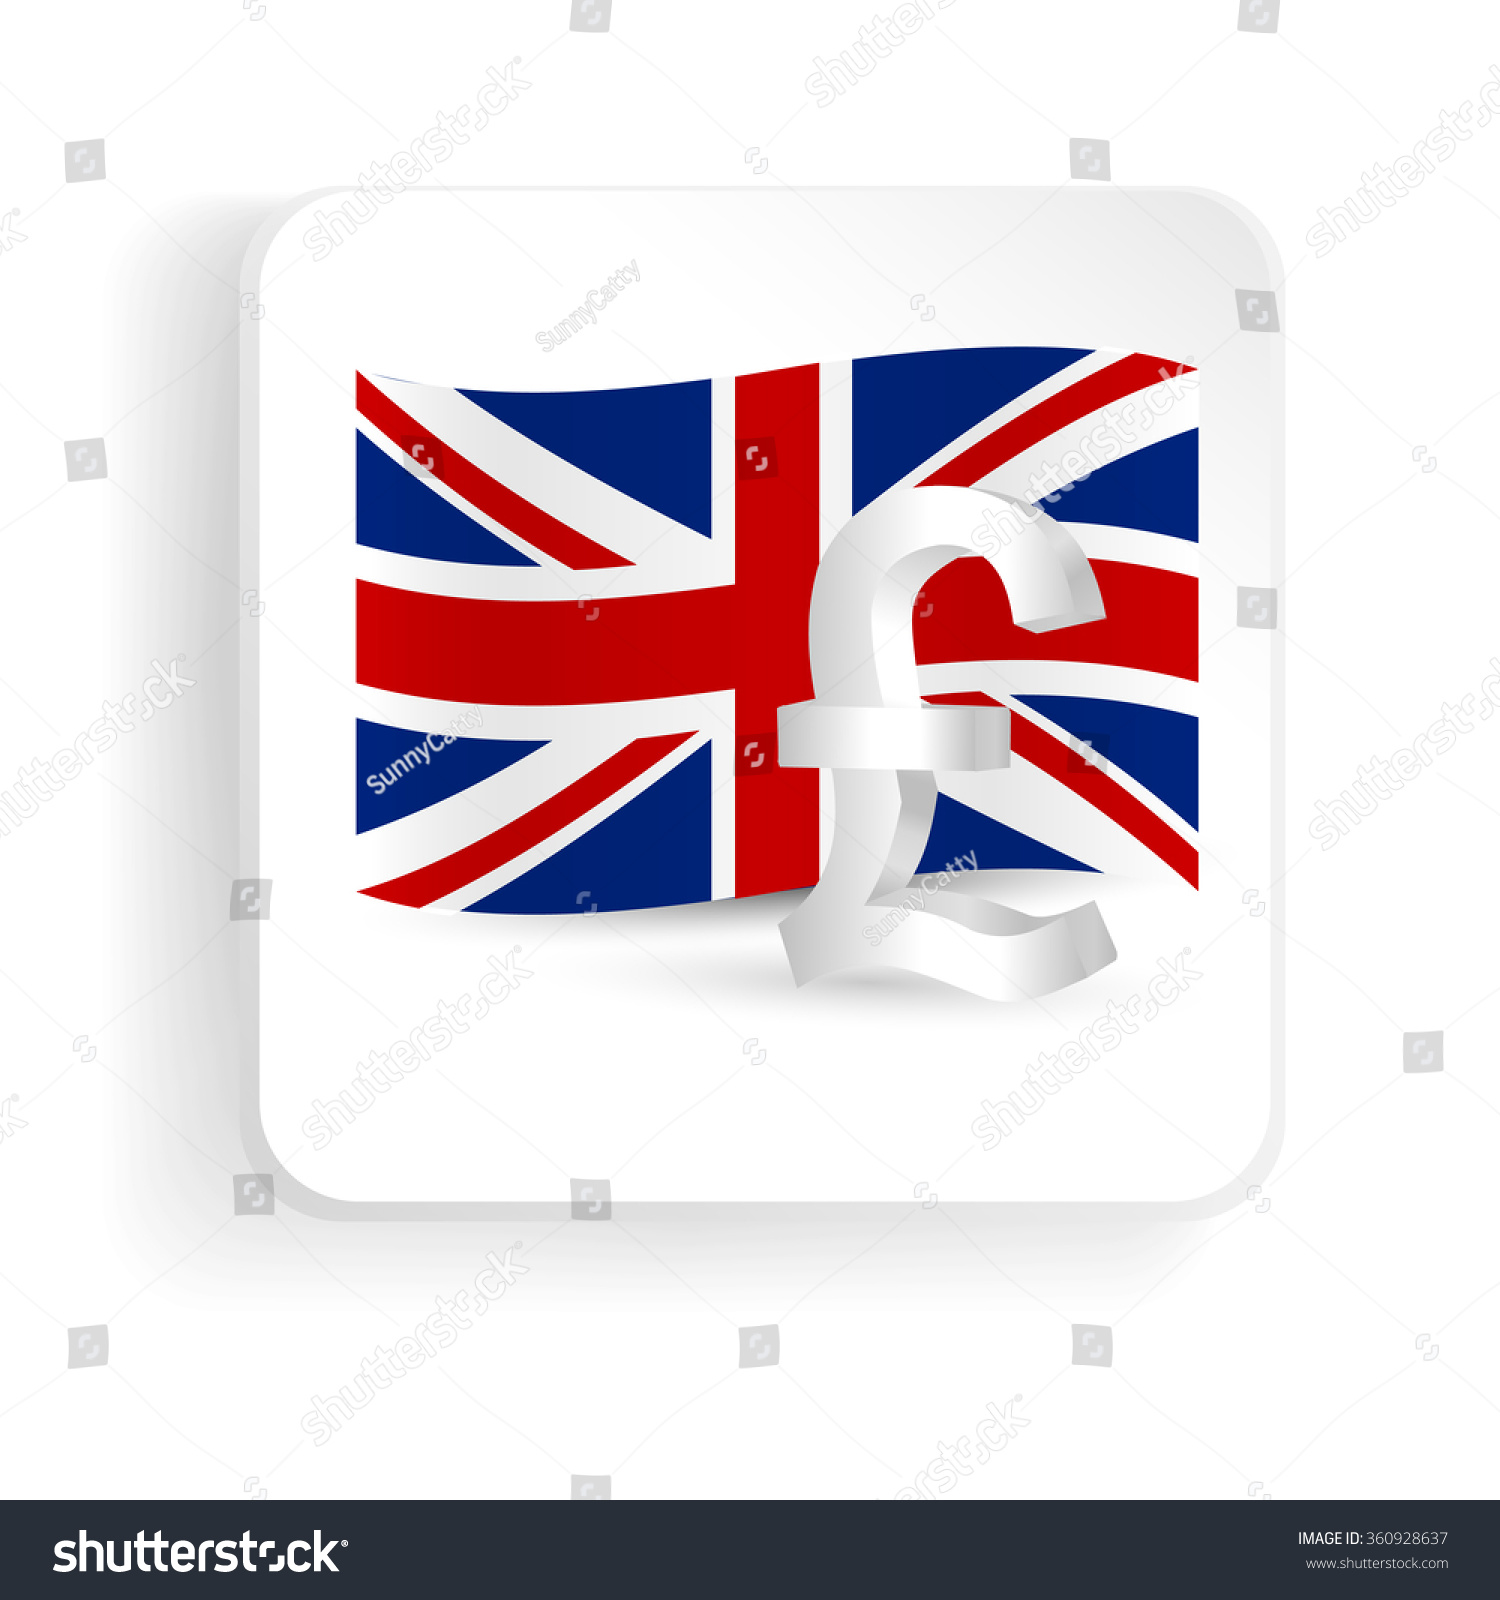 Pound symbol uk flag finance sign stock vector 360928637 pound symbol with uk flag finance sign icon vector illustration buycottarizona